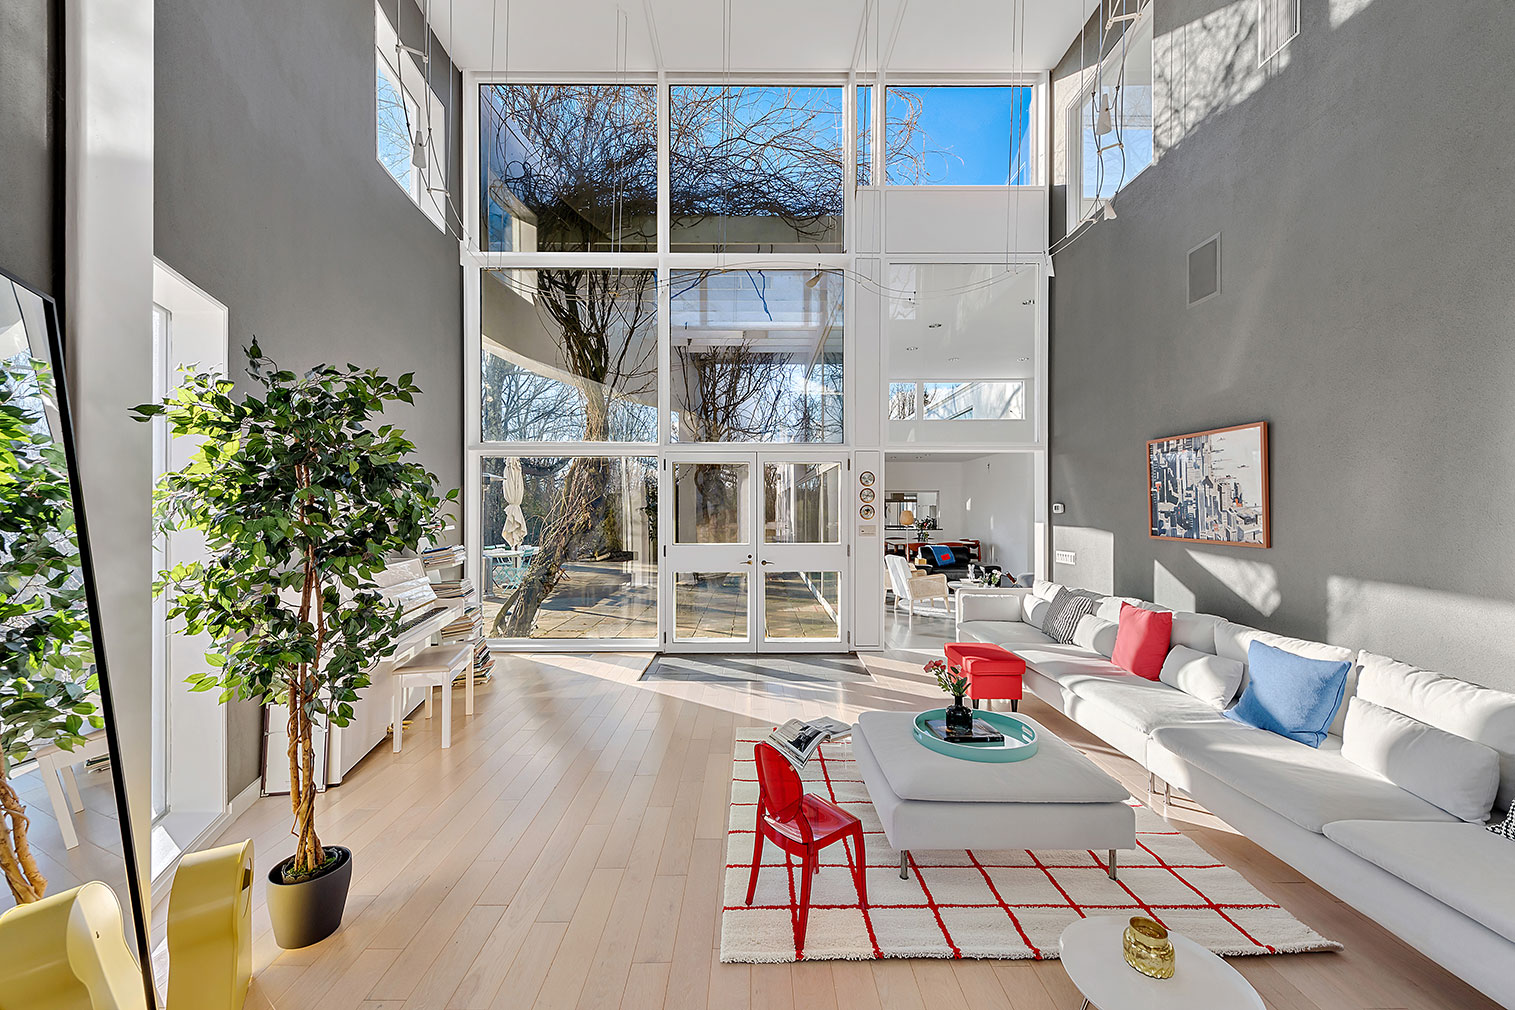 Award-winning Postmodern New York home by Robert A M Stern lists for $2.75m